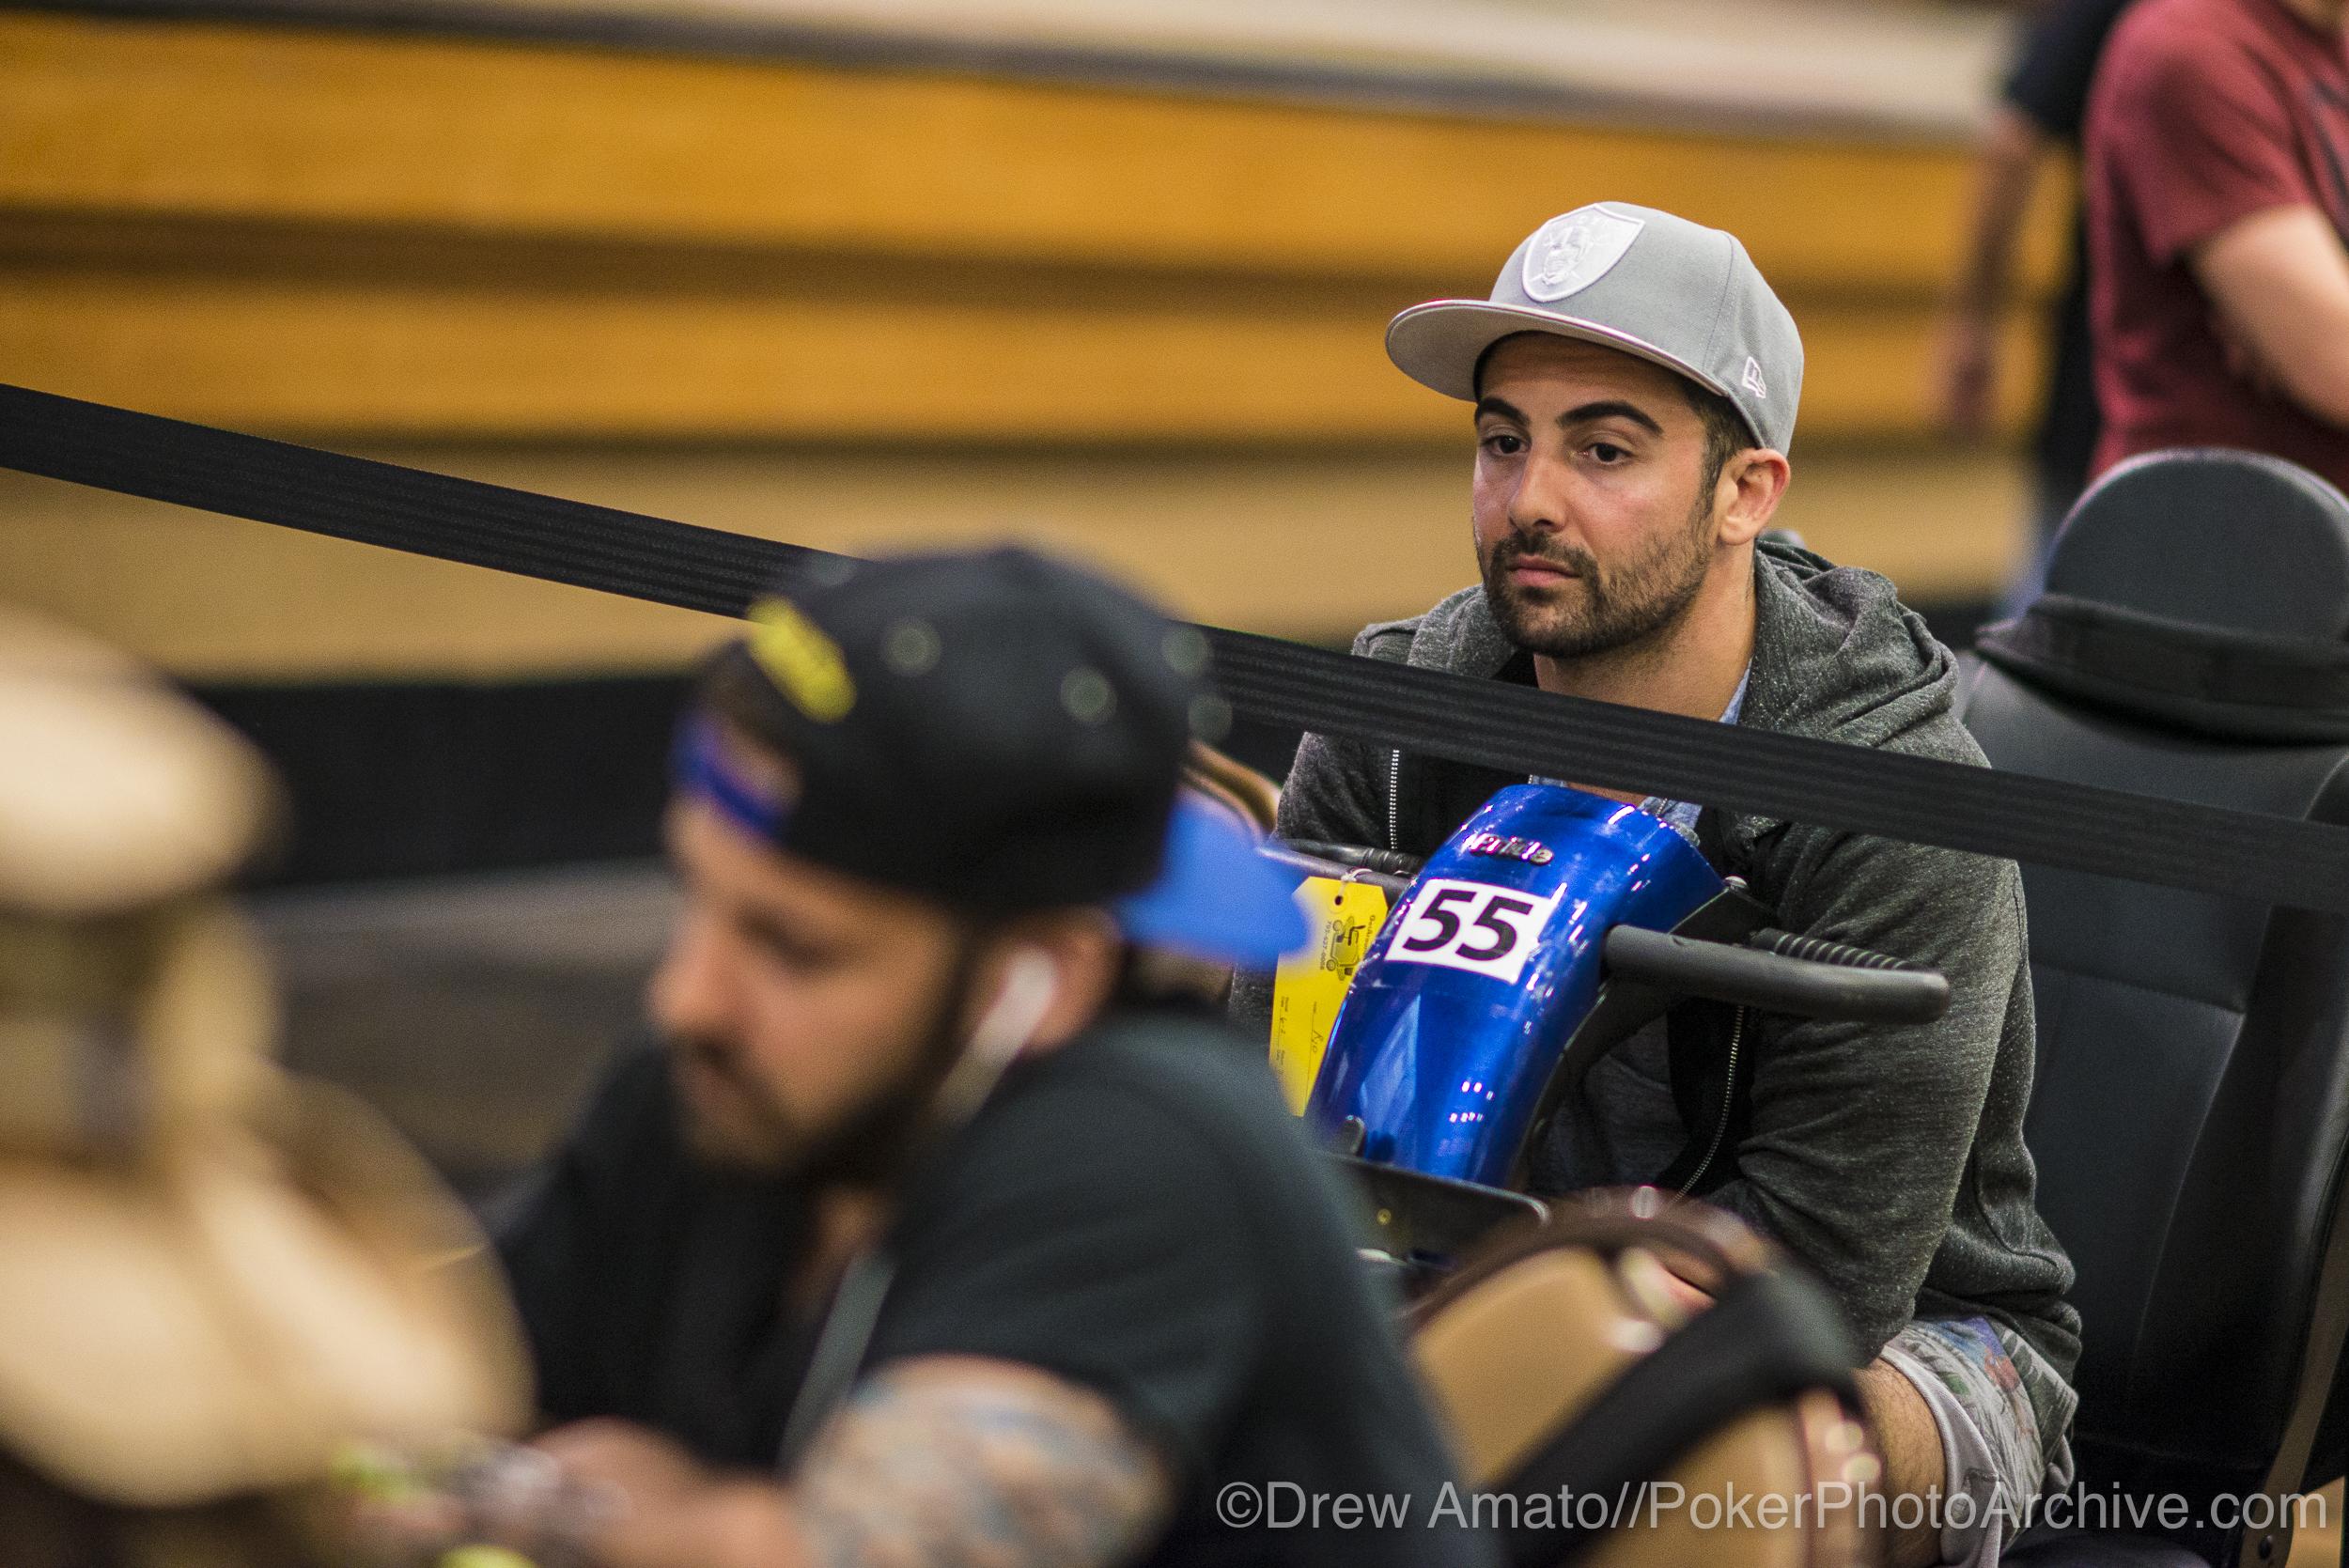 Aaron Massey watches his brother Ralph Massey_2017 WSOP_EV010_Day 3_Amato_DA68117.jpg